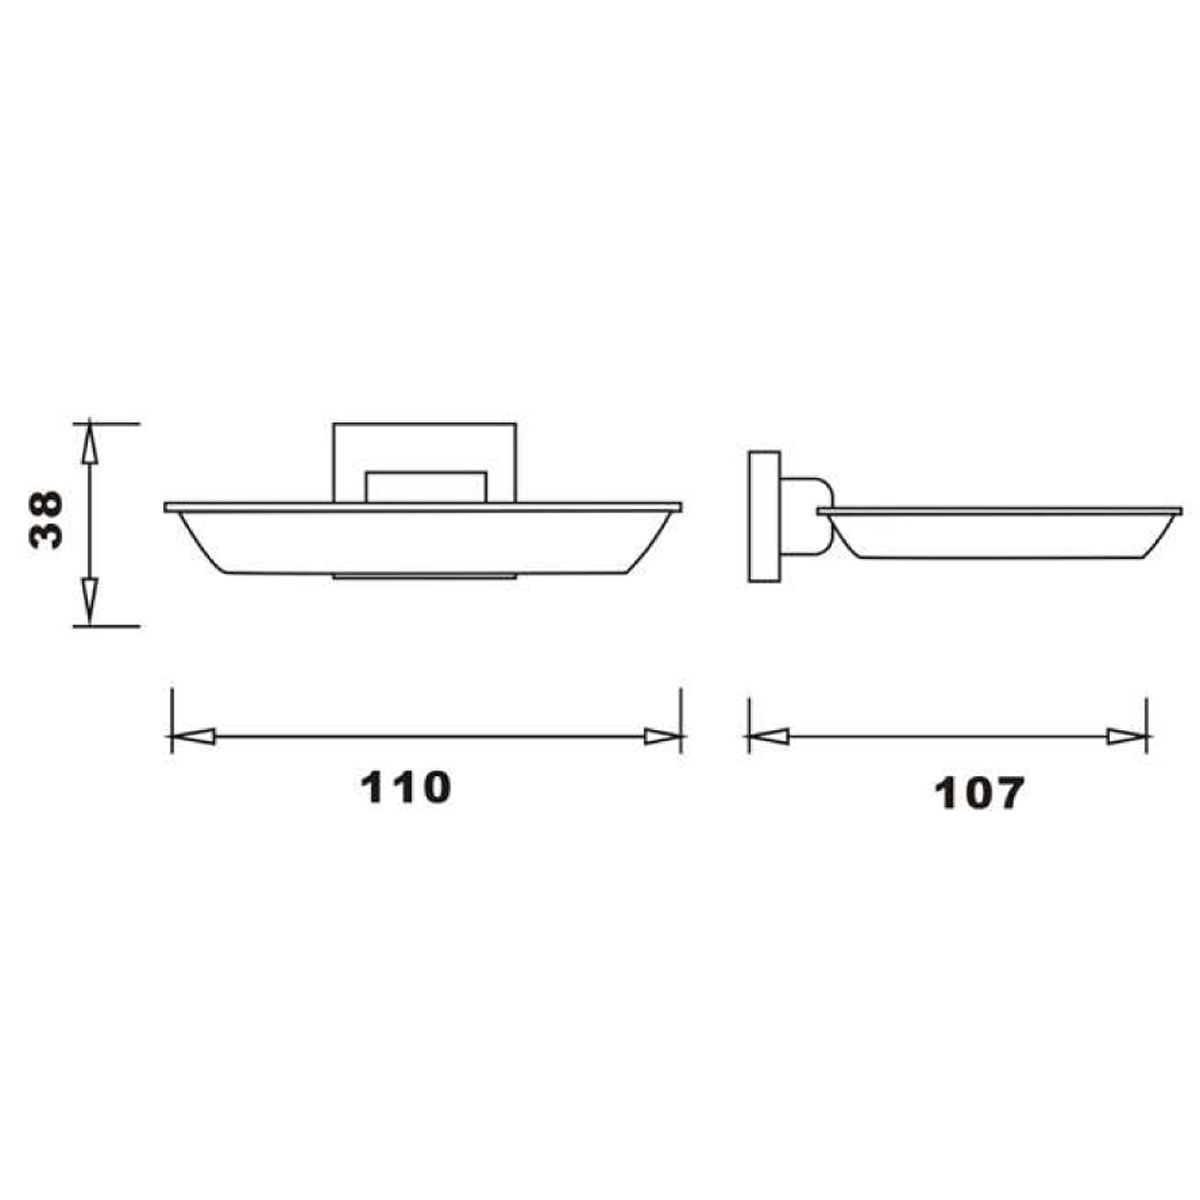 RAK Cubis Black Soap Dish Measurements